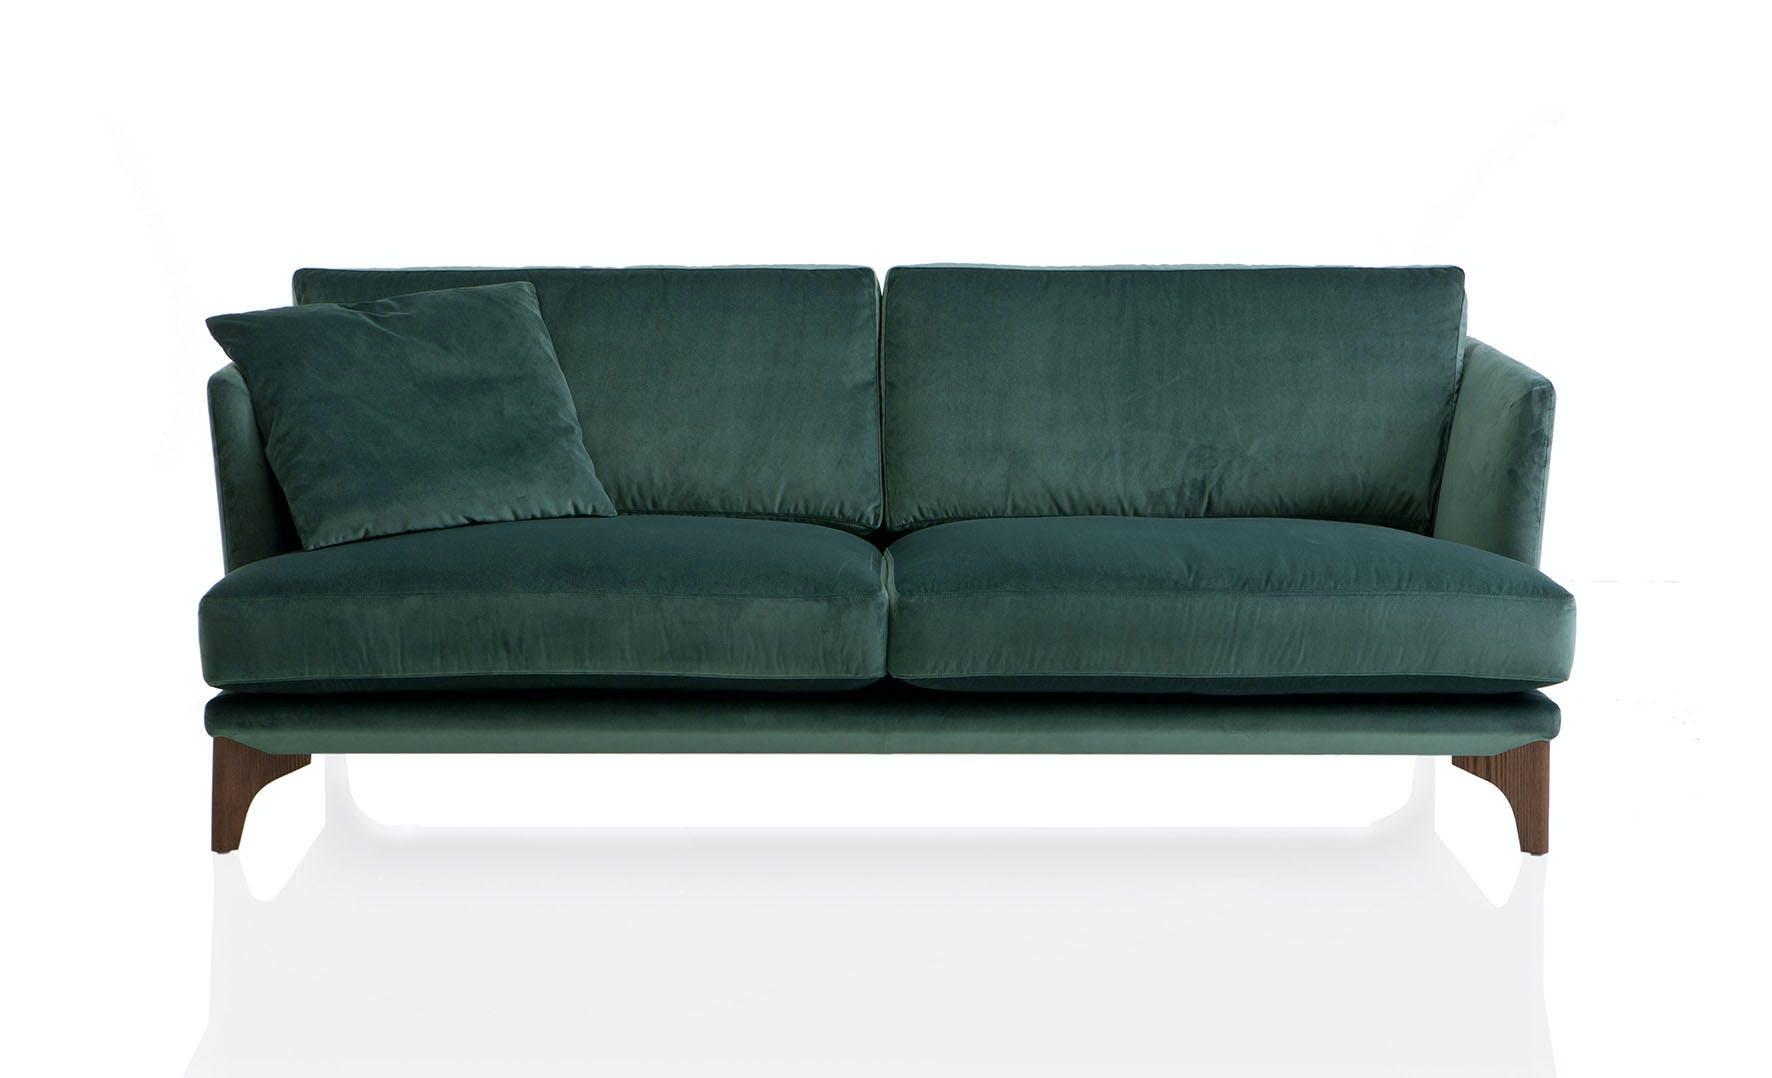 Jab Anstoetz Green Polo Living Sofa With Pillow Haute Living